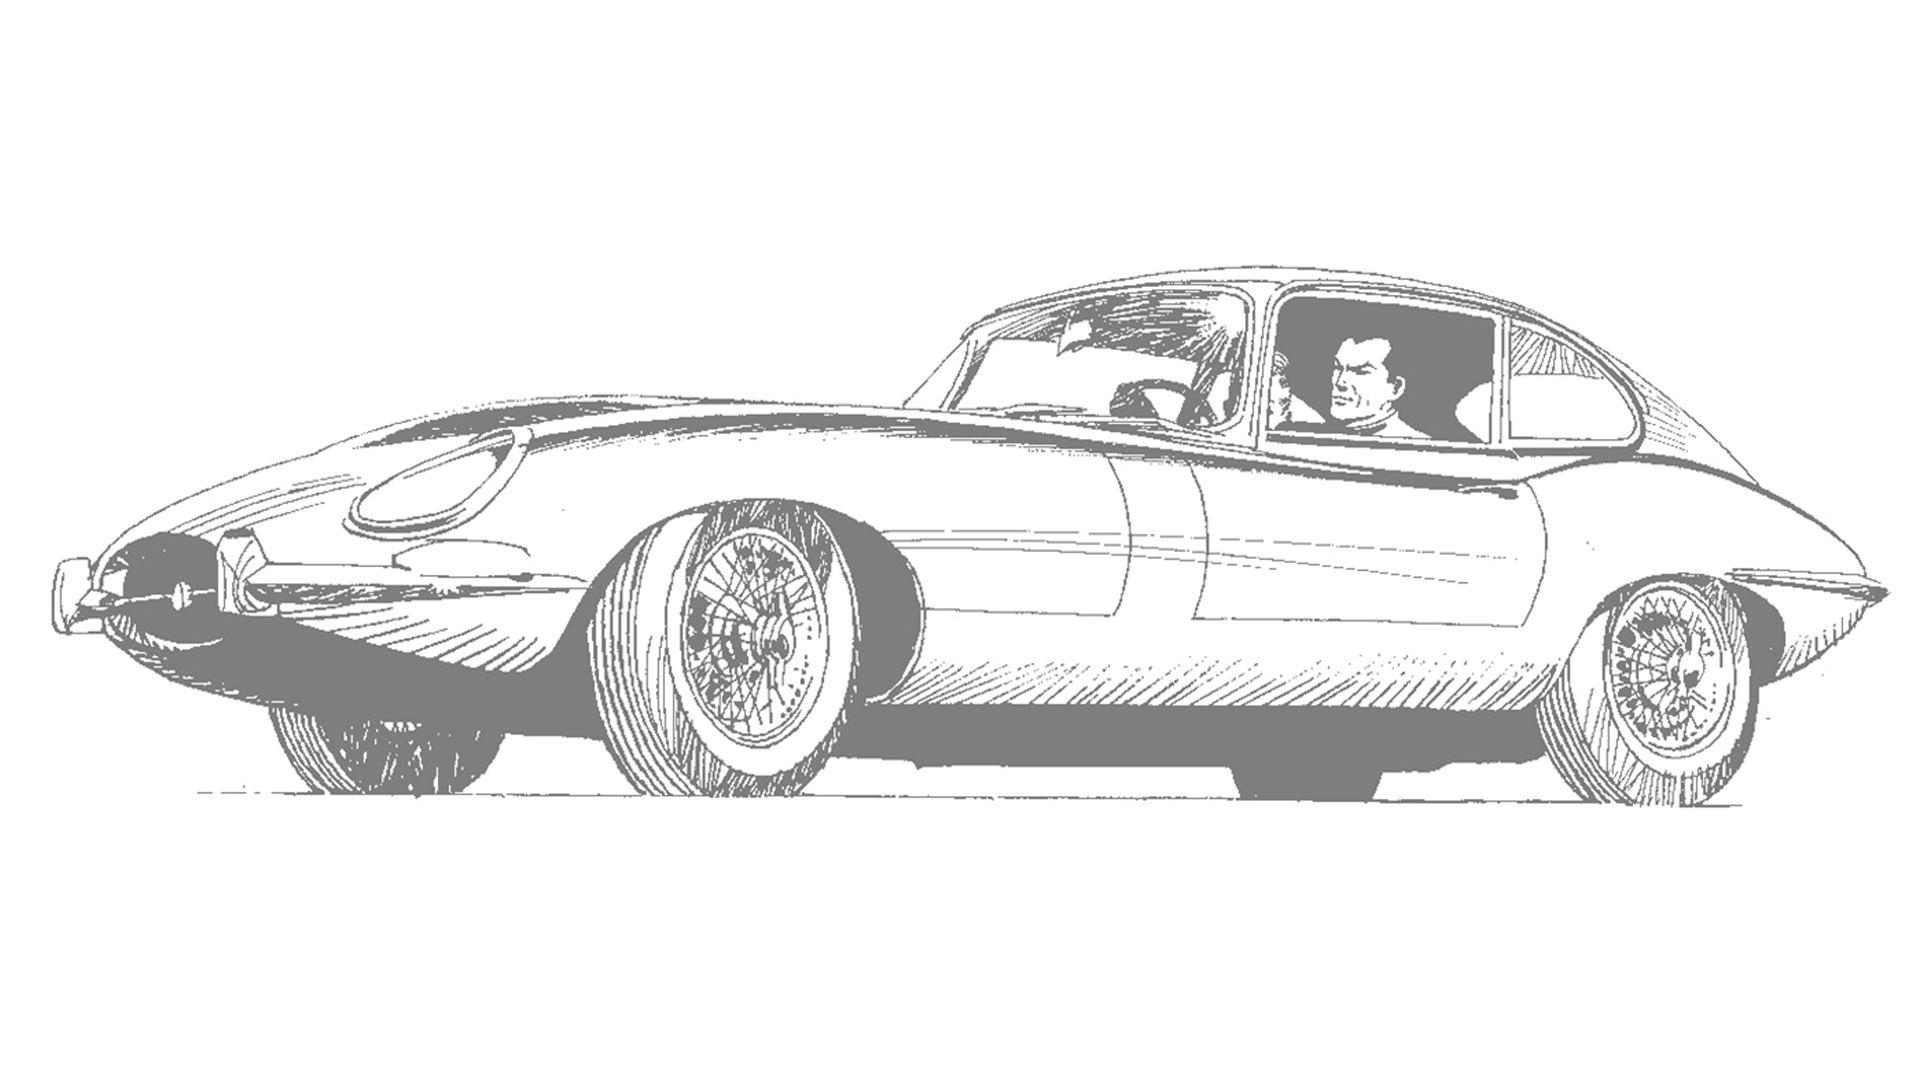 Perfect Anti-Heroes: Diabolik and the Jaguar E-Type